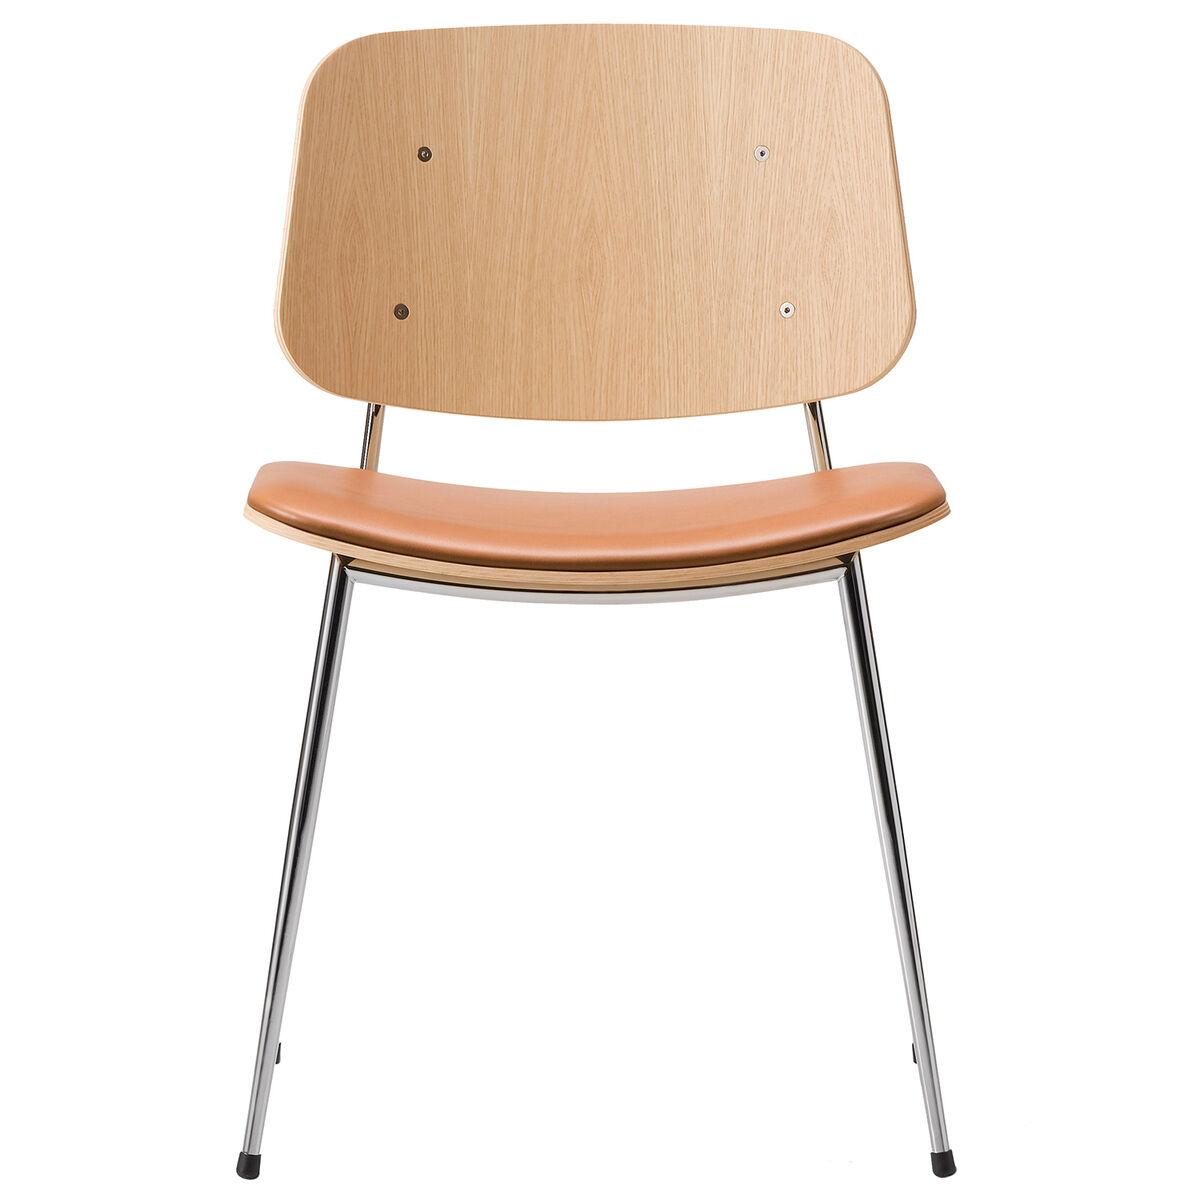 Fredericia S�borg tuoli 3061, kromattu runko, lakattu tammi - ruskea nahka